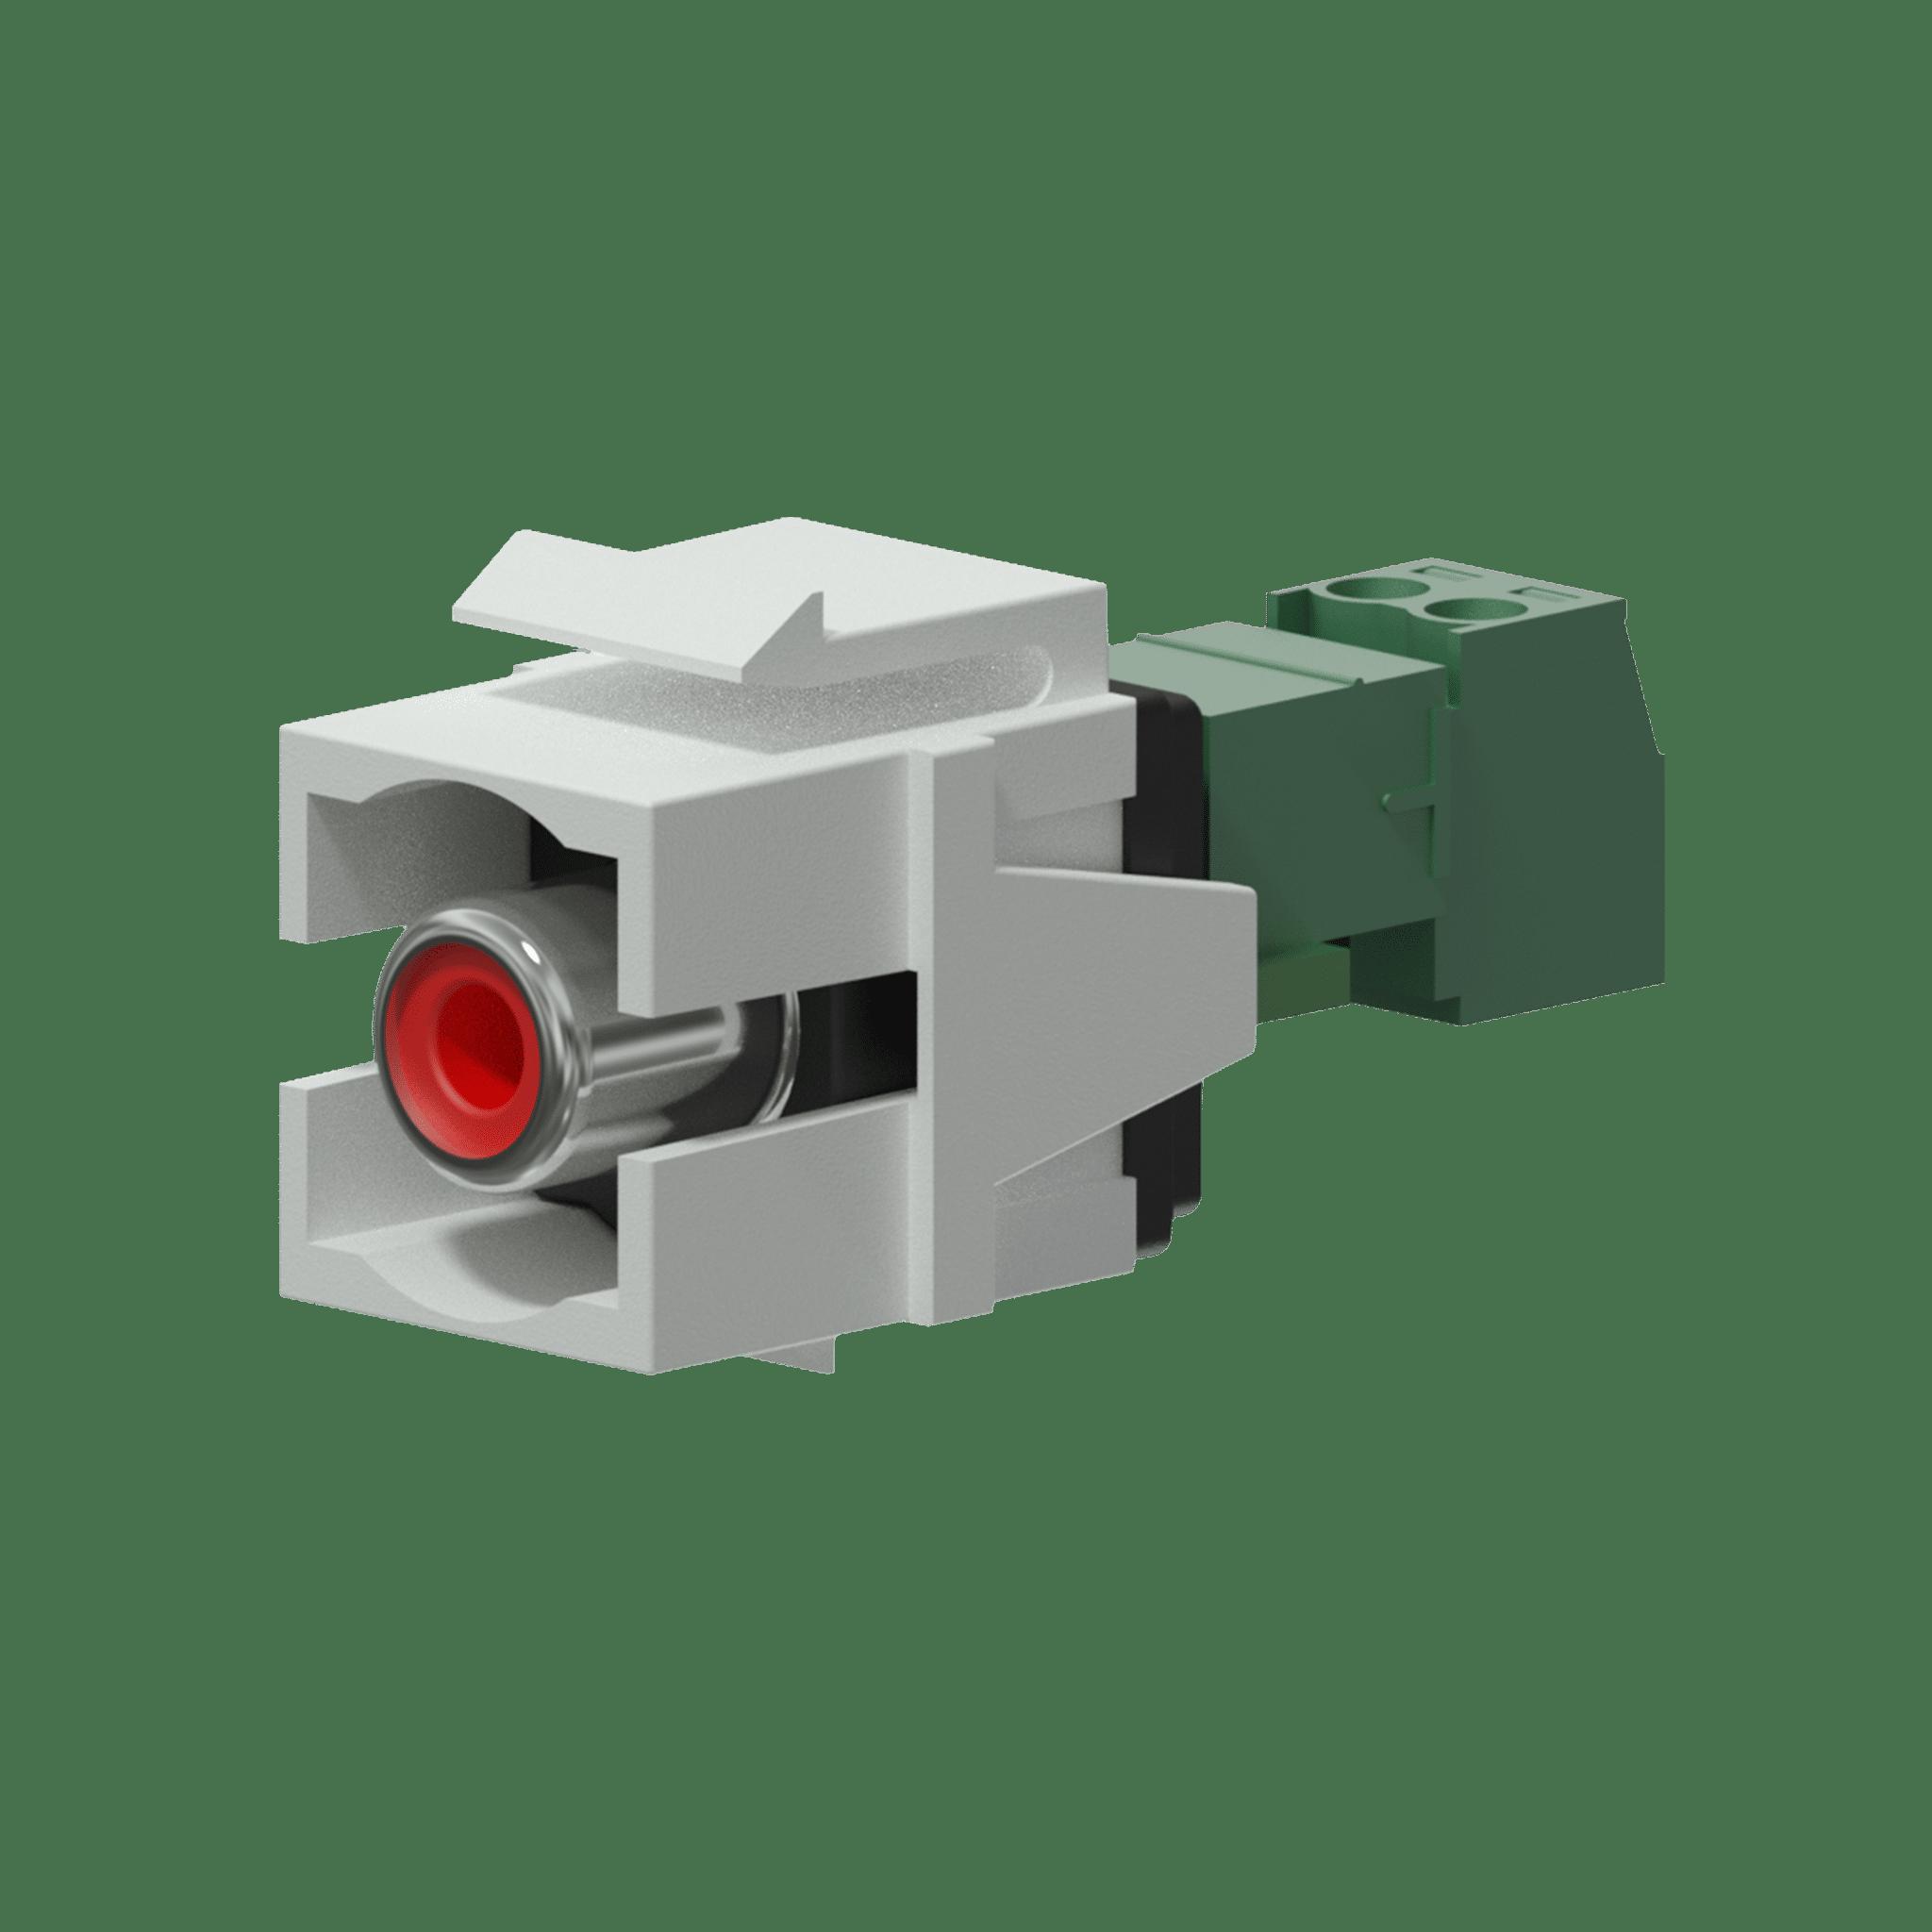 VCK105P/W - White